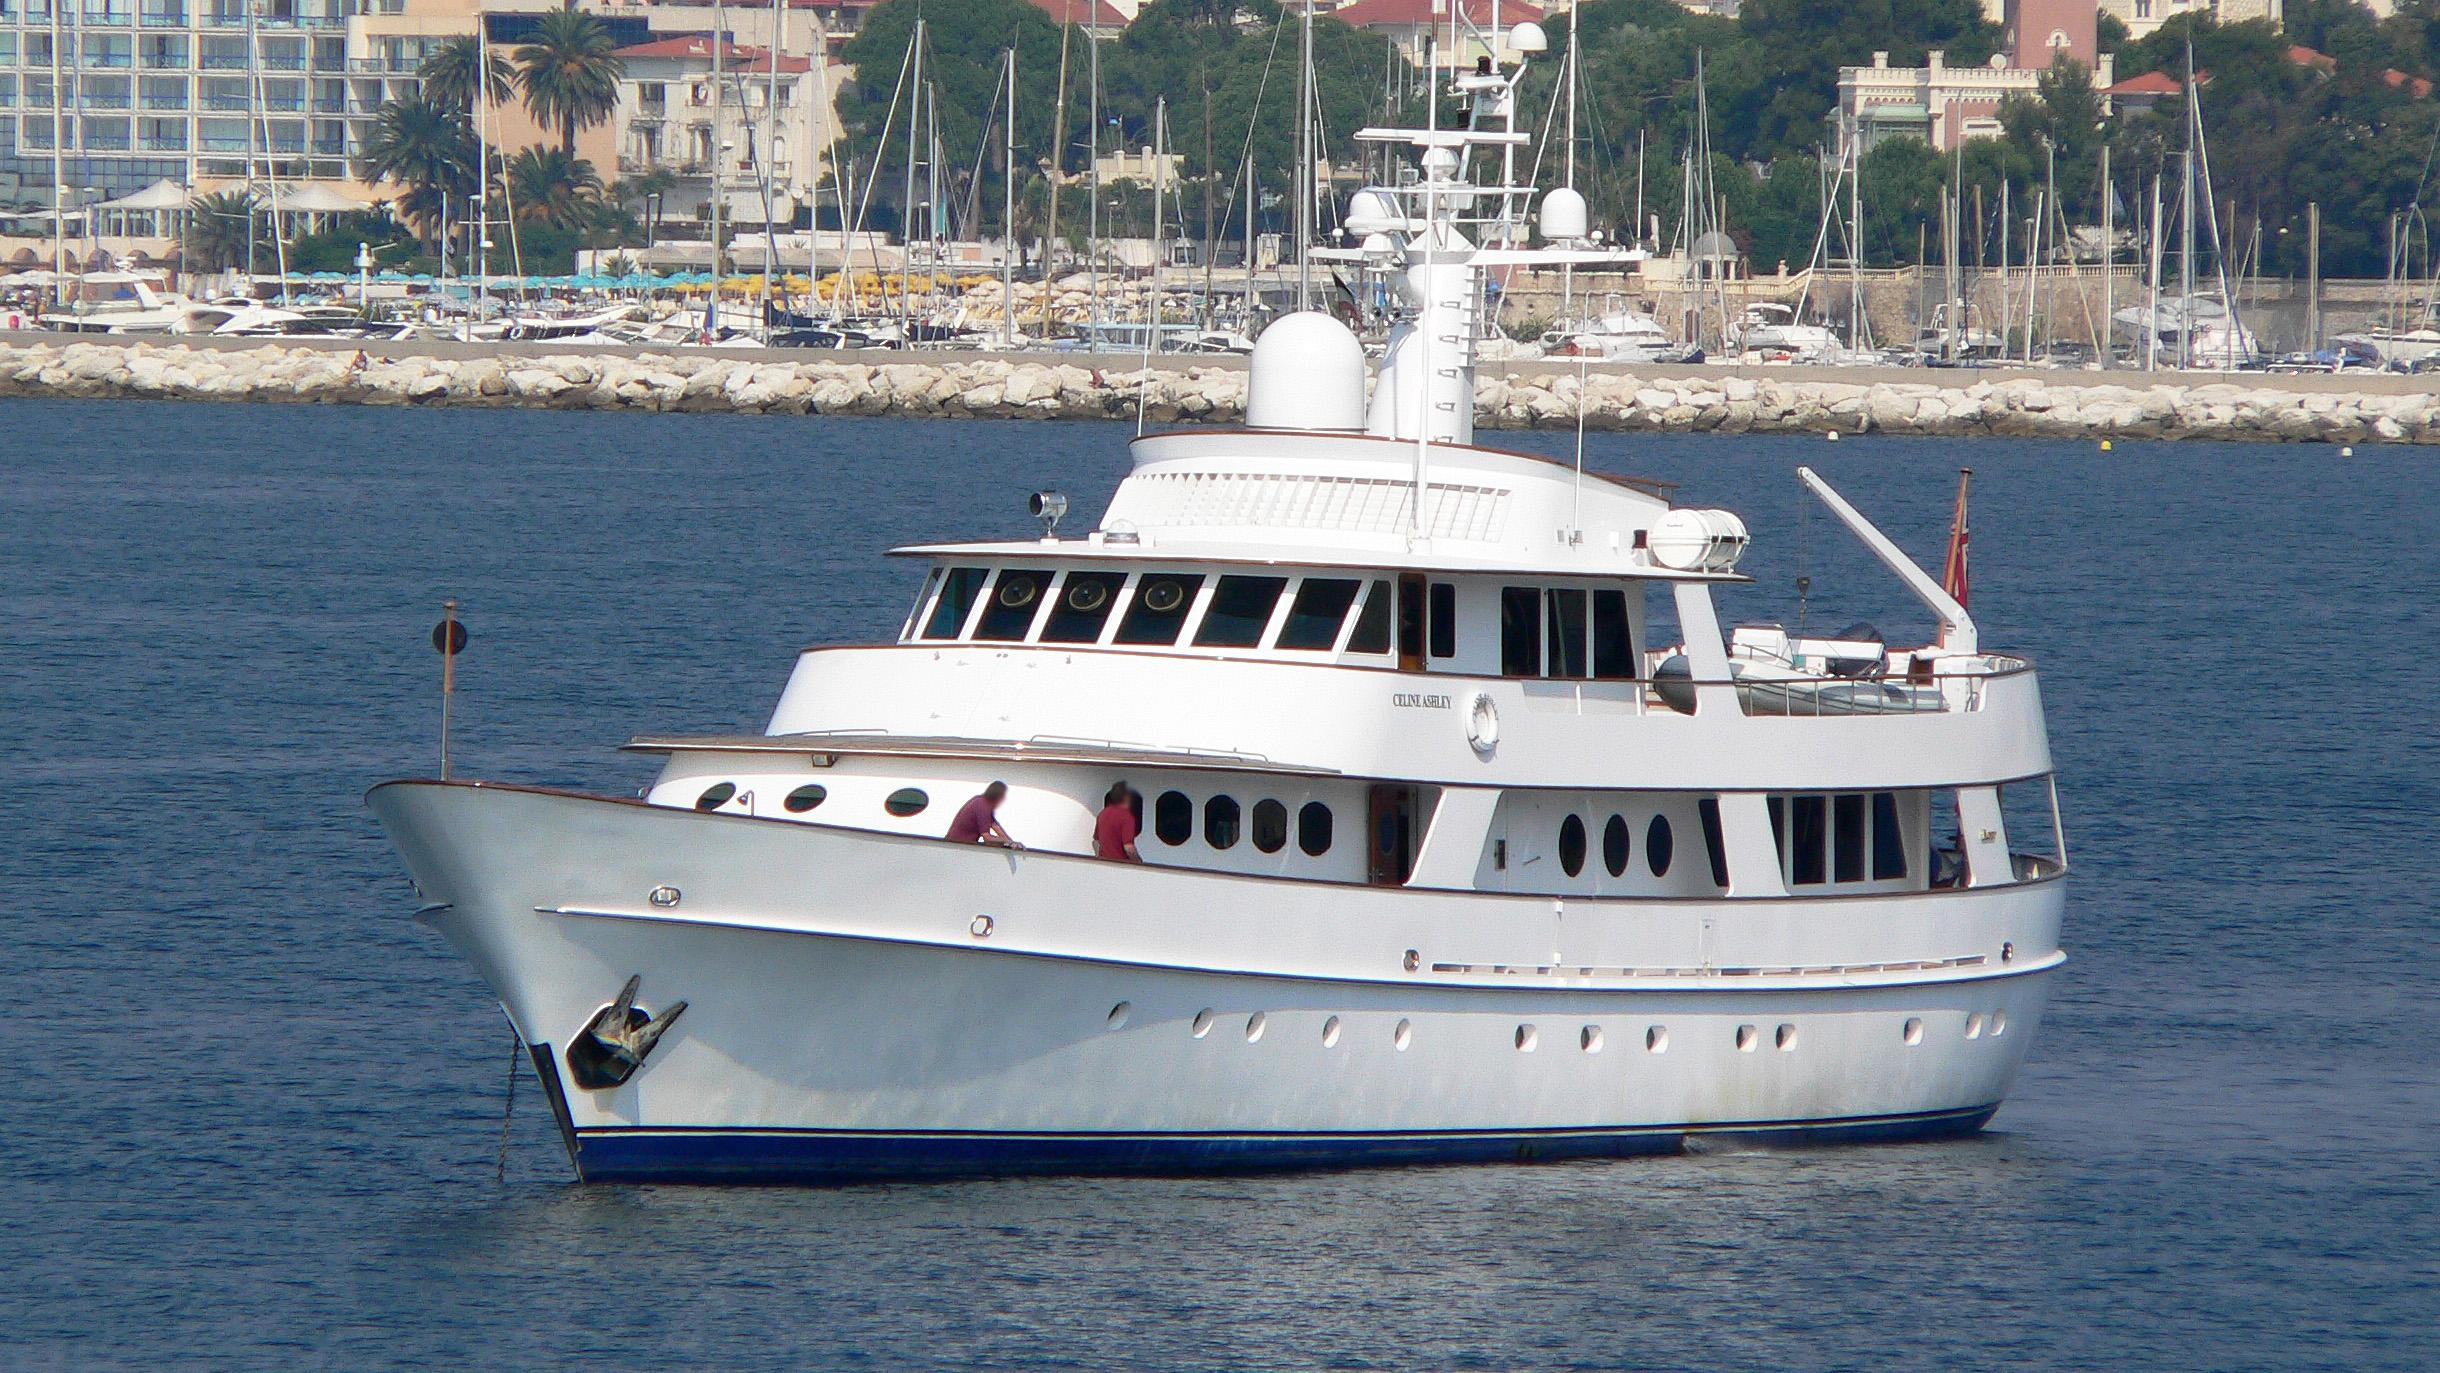 c-side-motor-yacht-feadship-1979-34m-half-profile